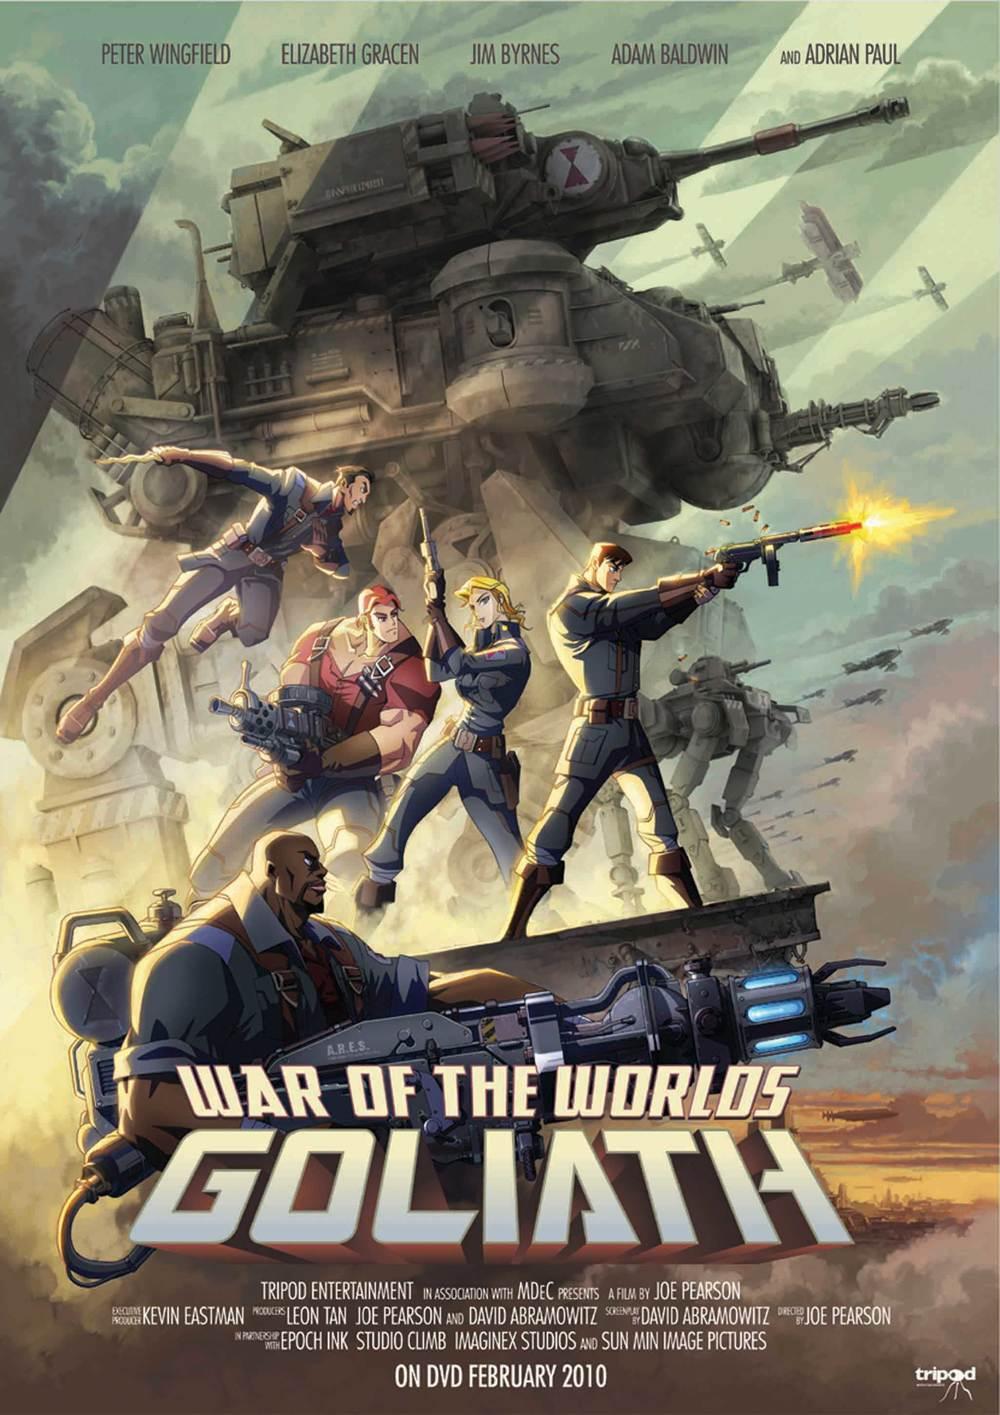 war-of-the-worlds-goliath-must-watch-trailer